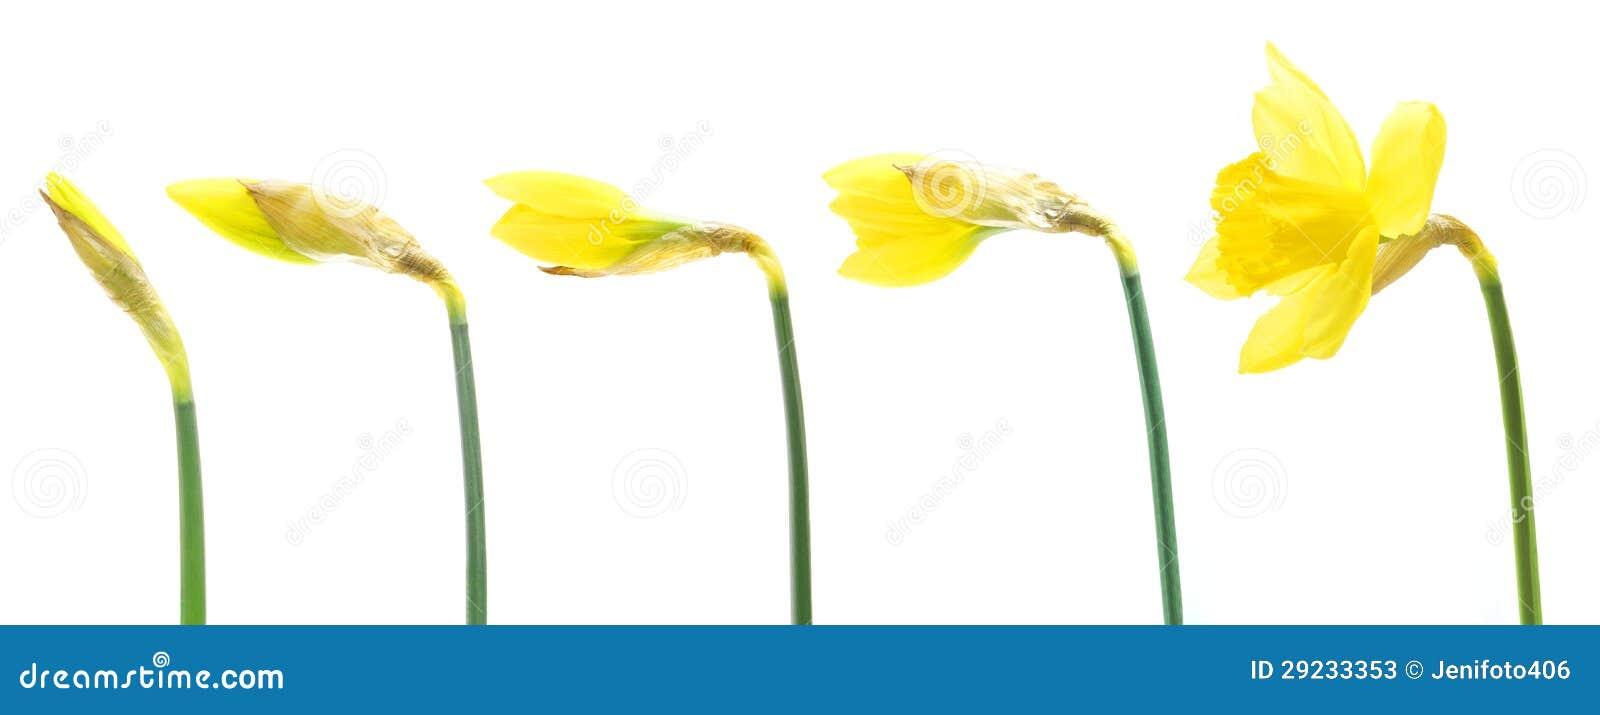 Growing Daffodils Stock Photos - Image: 29233353